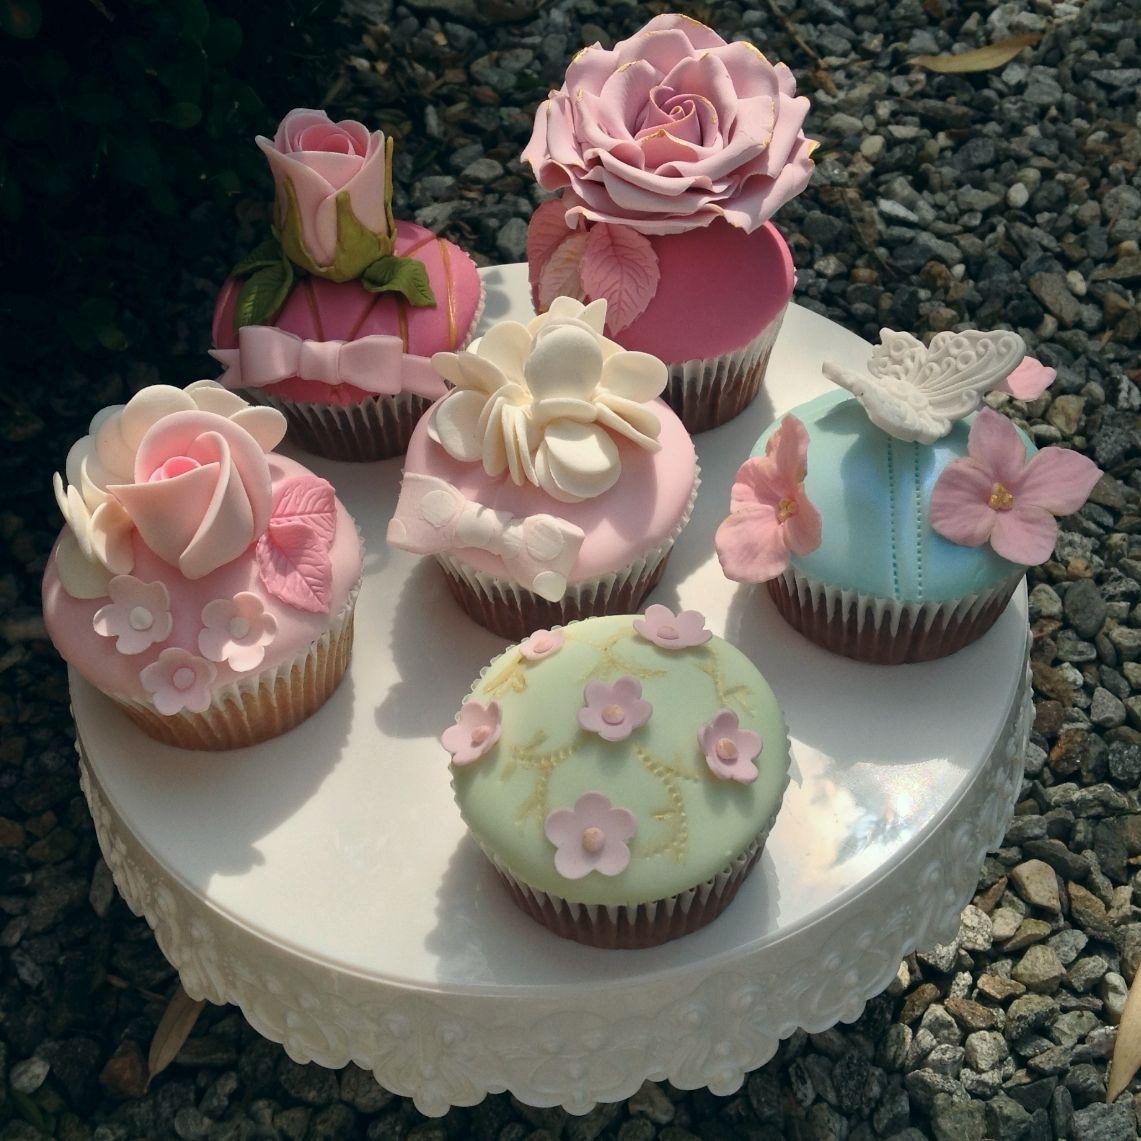 Anny's Cupcake